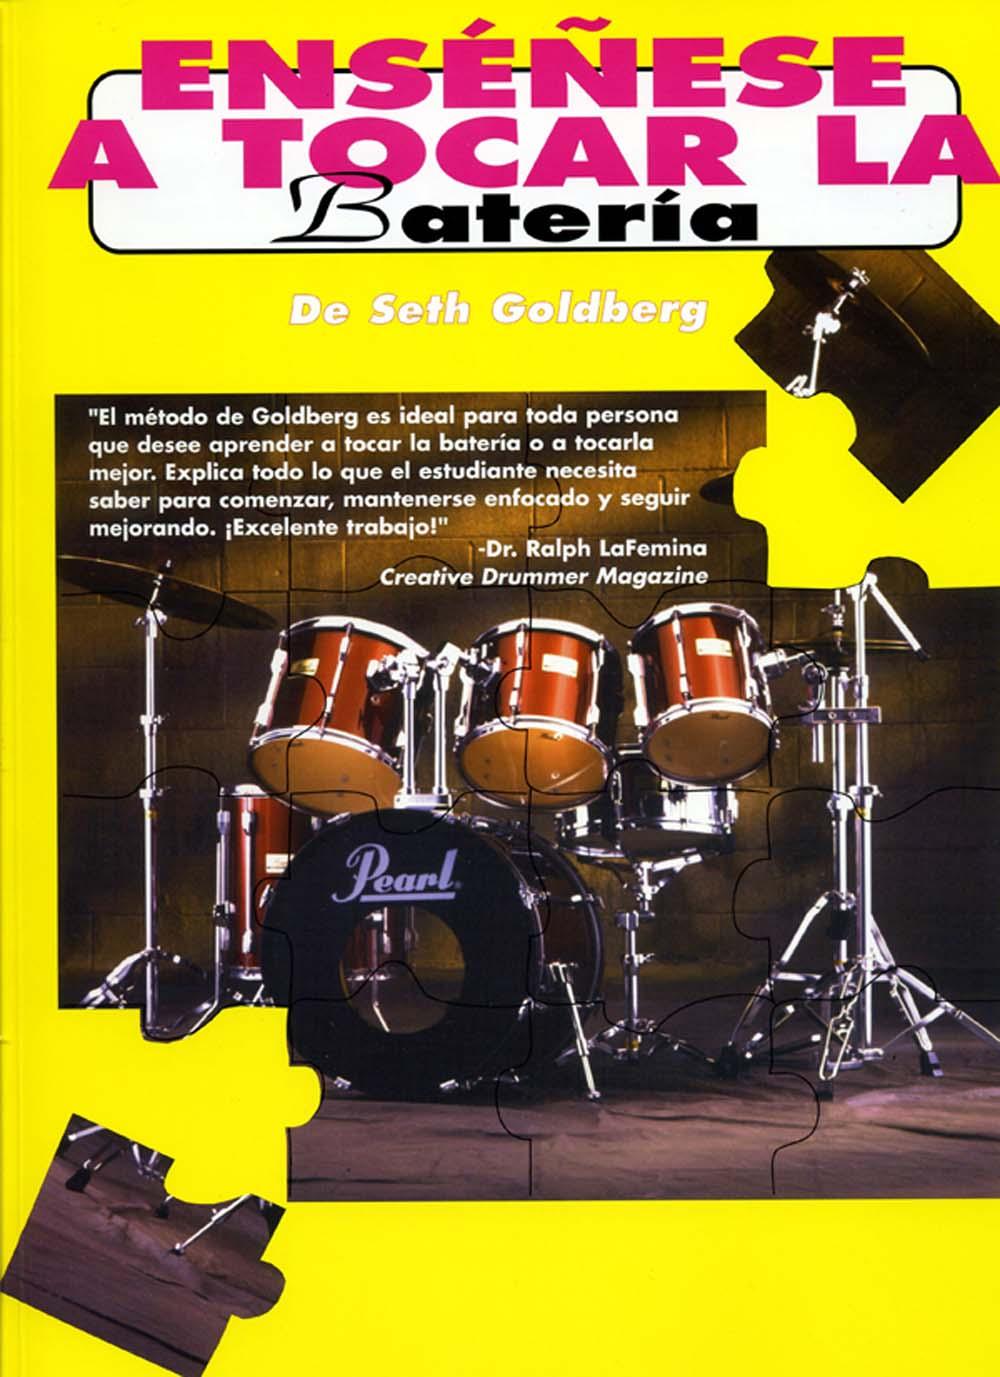 Seth Goldberg: Ensenese A Tocar La Bateria: Drum Kit: Instrumental Tutor